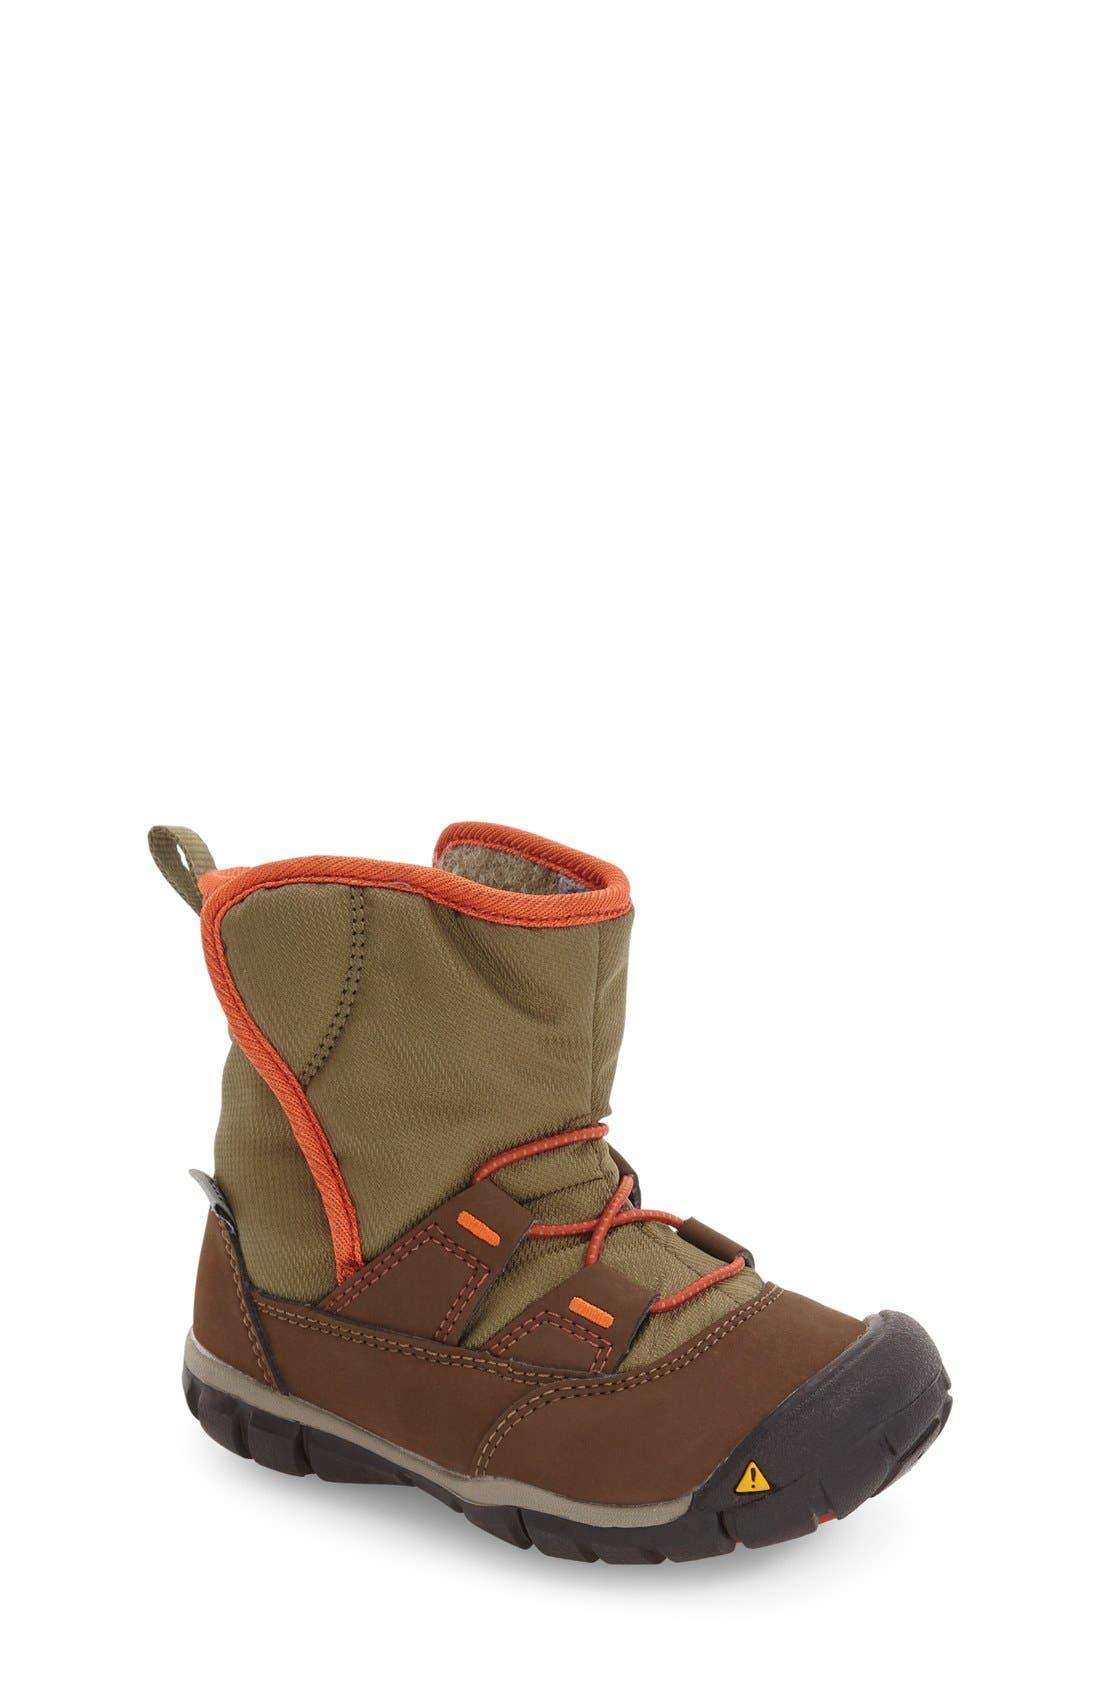 Peek-A-Boot Boot,                         Main,                         color, 201